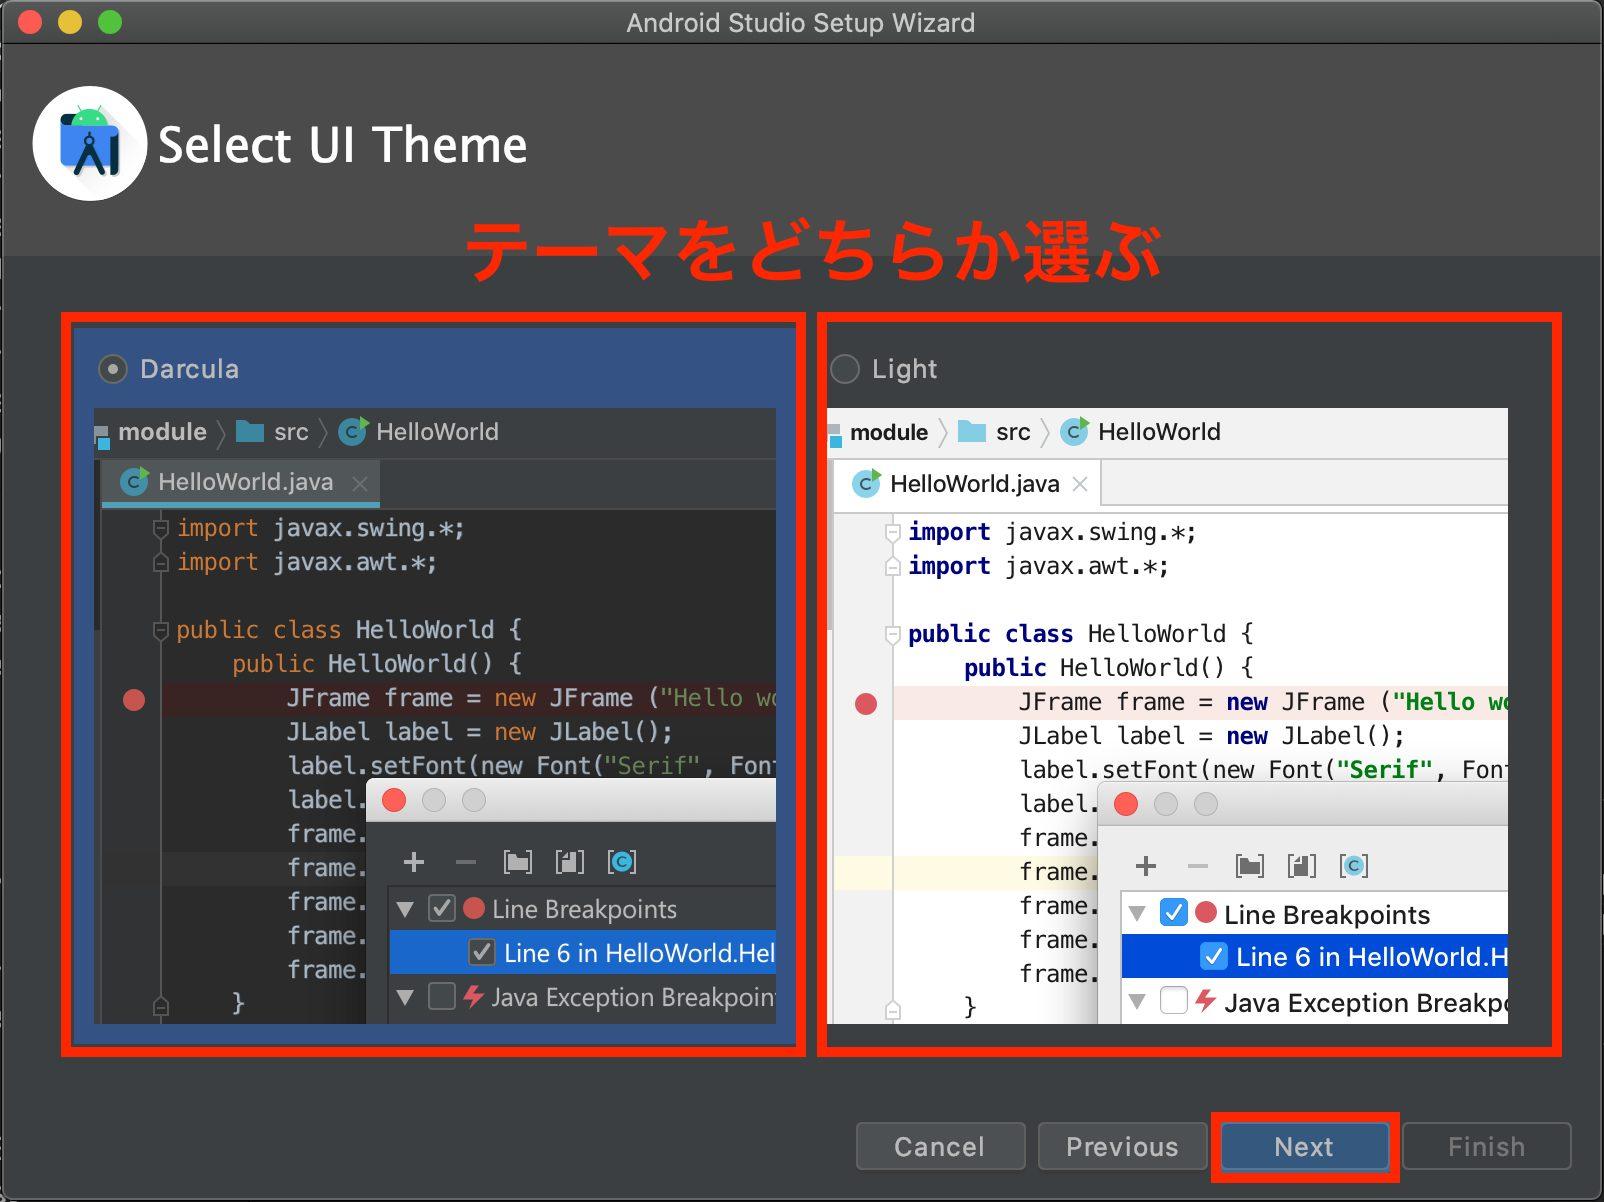 Android Studioのテーマ選択画面の画像